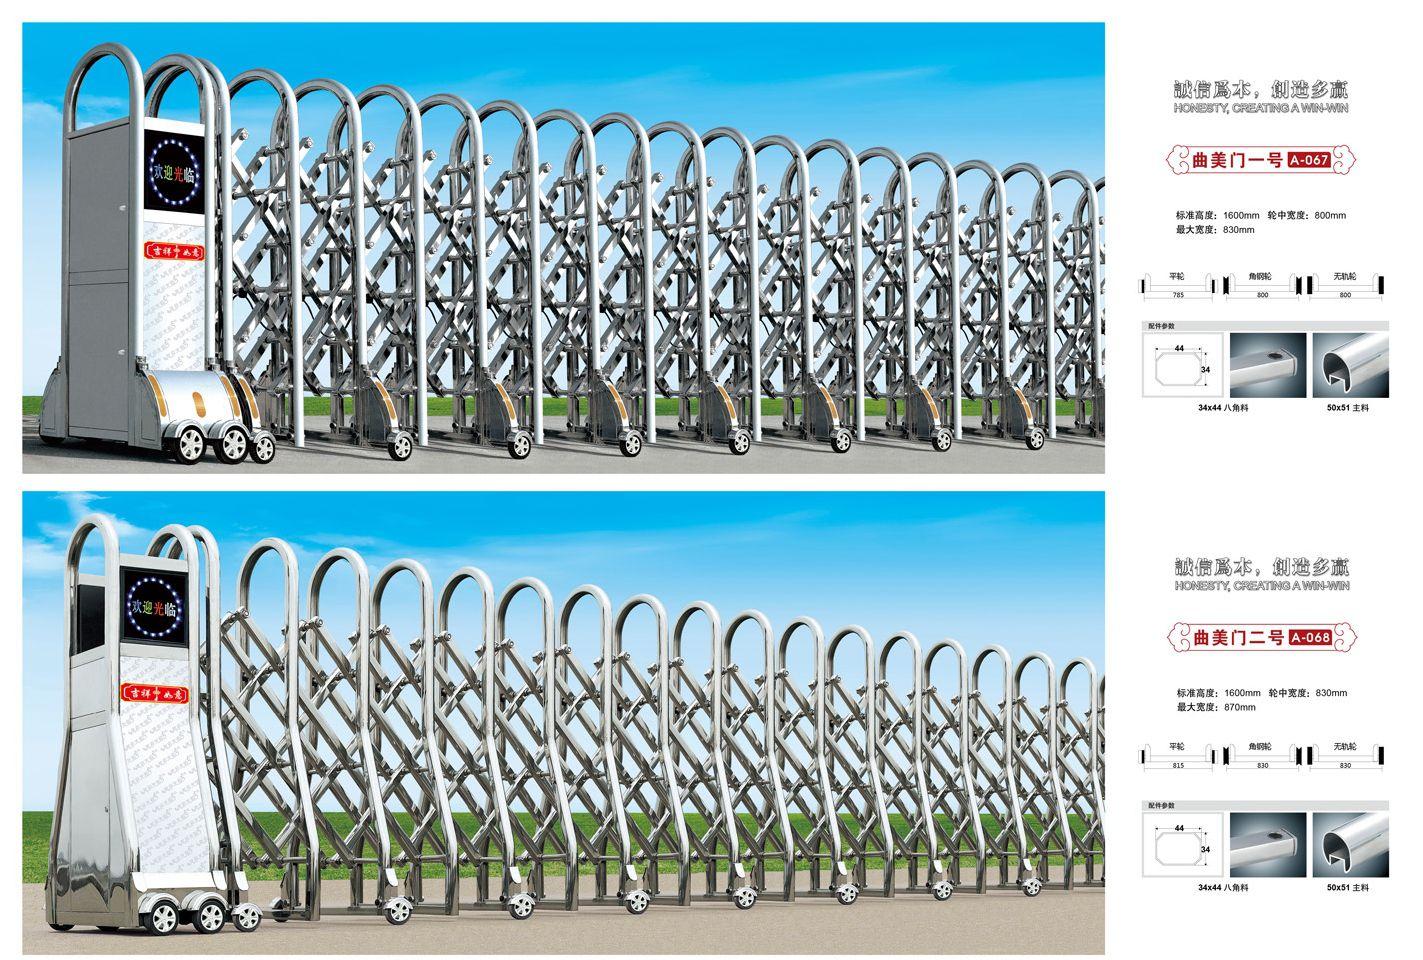 yxsddm018松山湖电动伸缩门